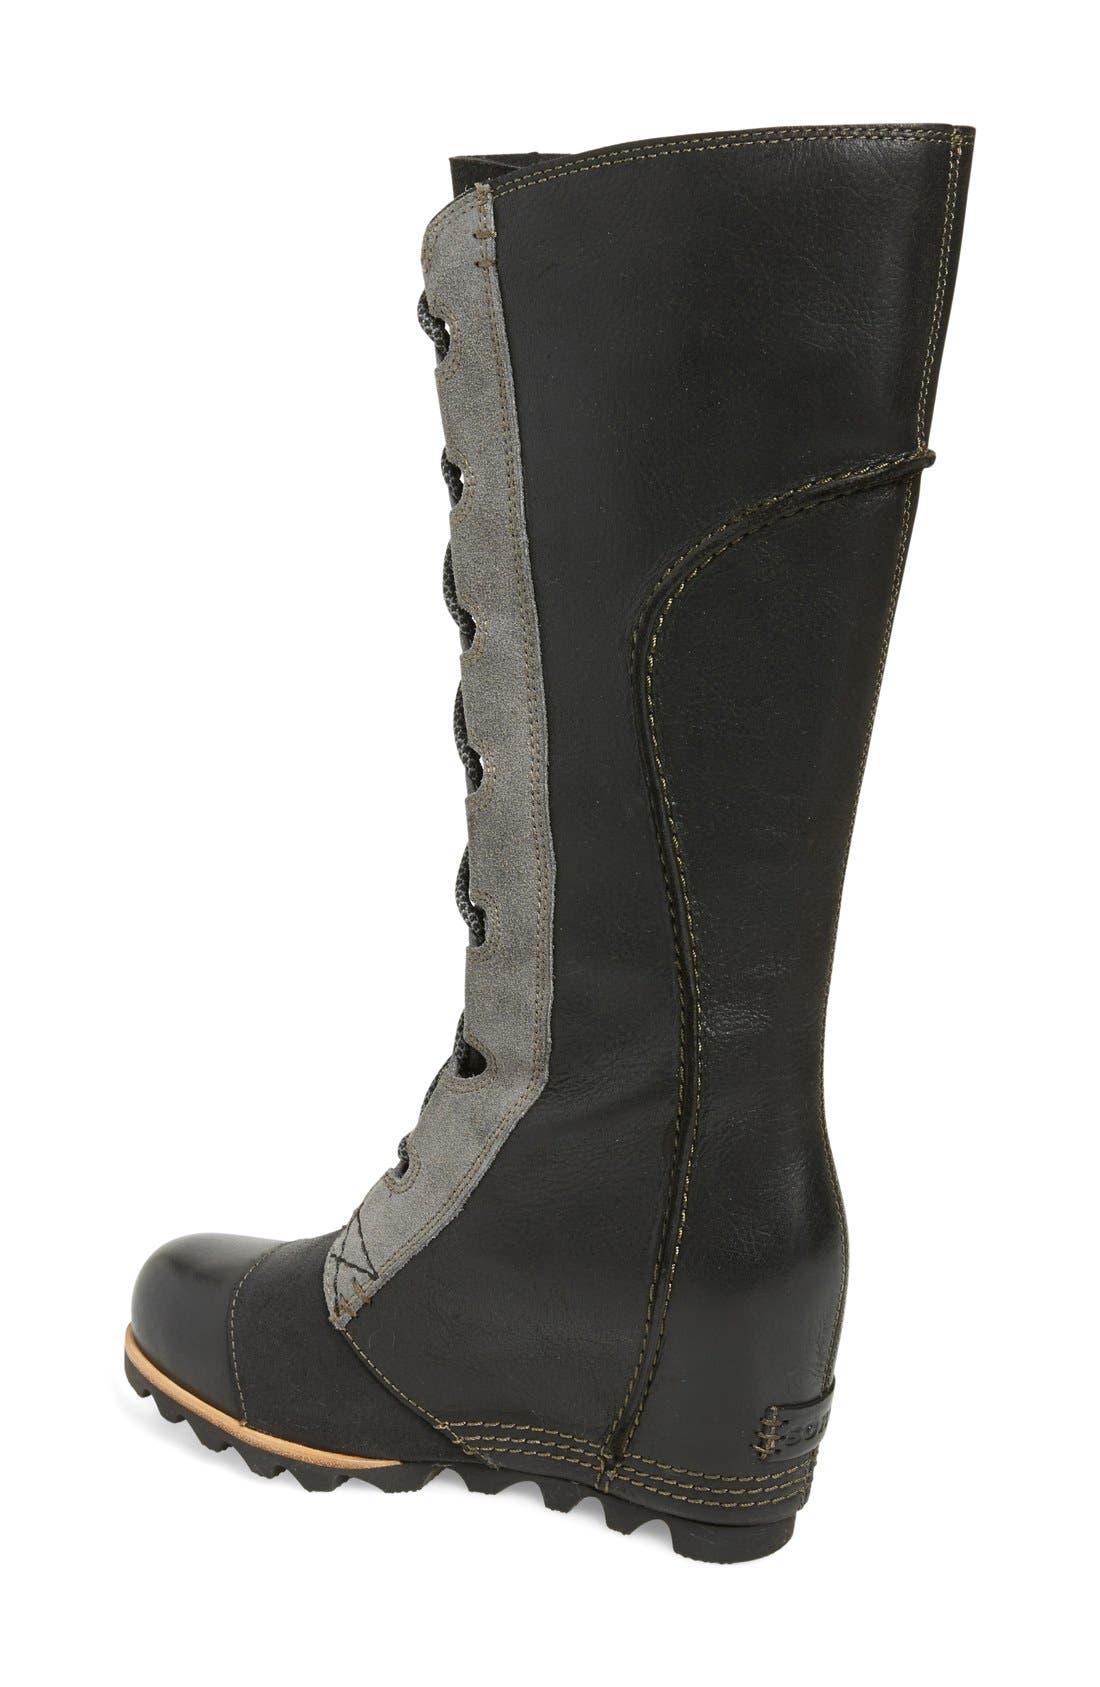 Alternate Image 2  - SOREL 'Cate the Great' Waterproof Wedge Boot (Women)